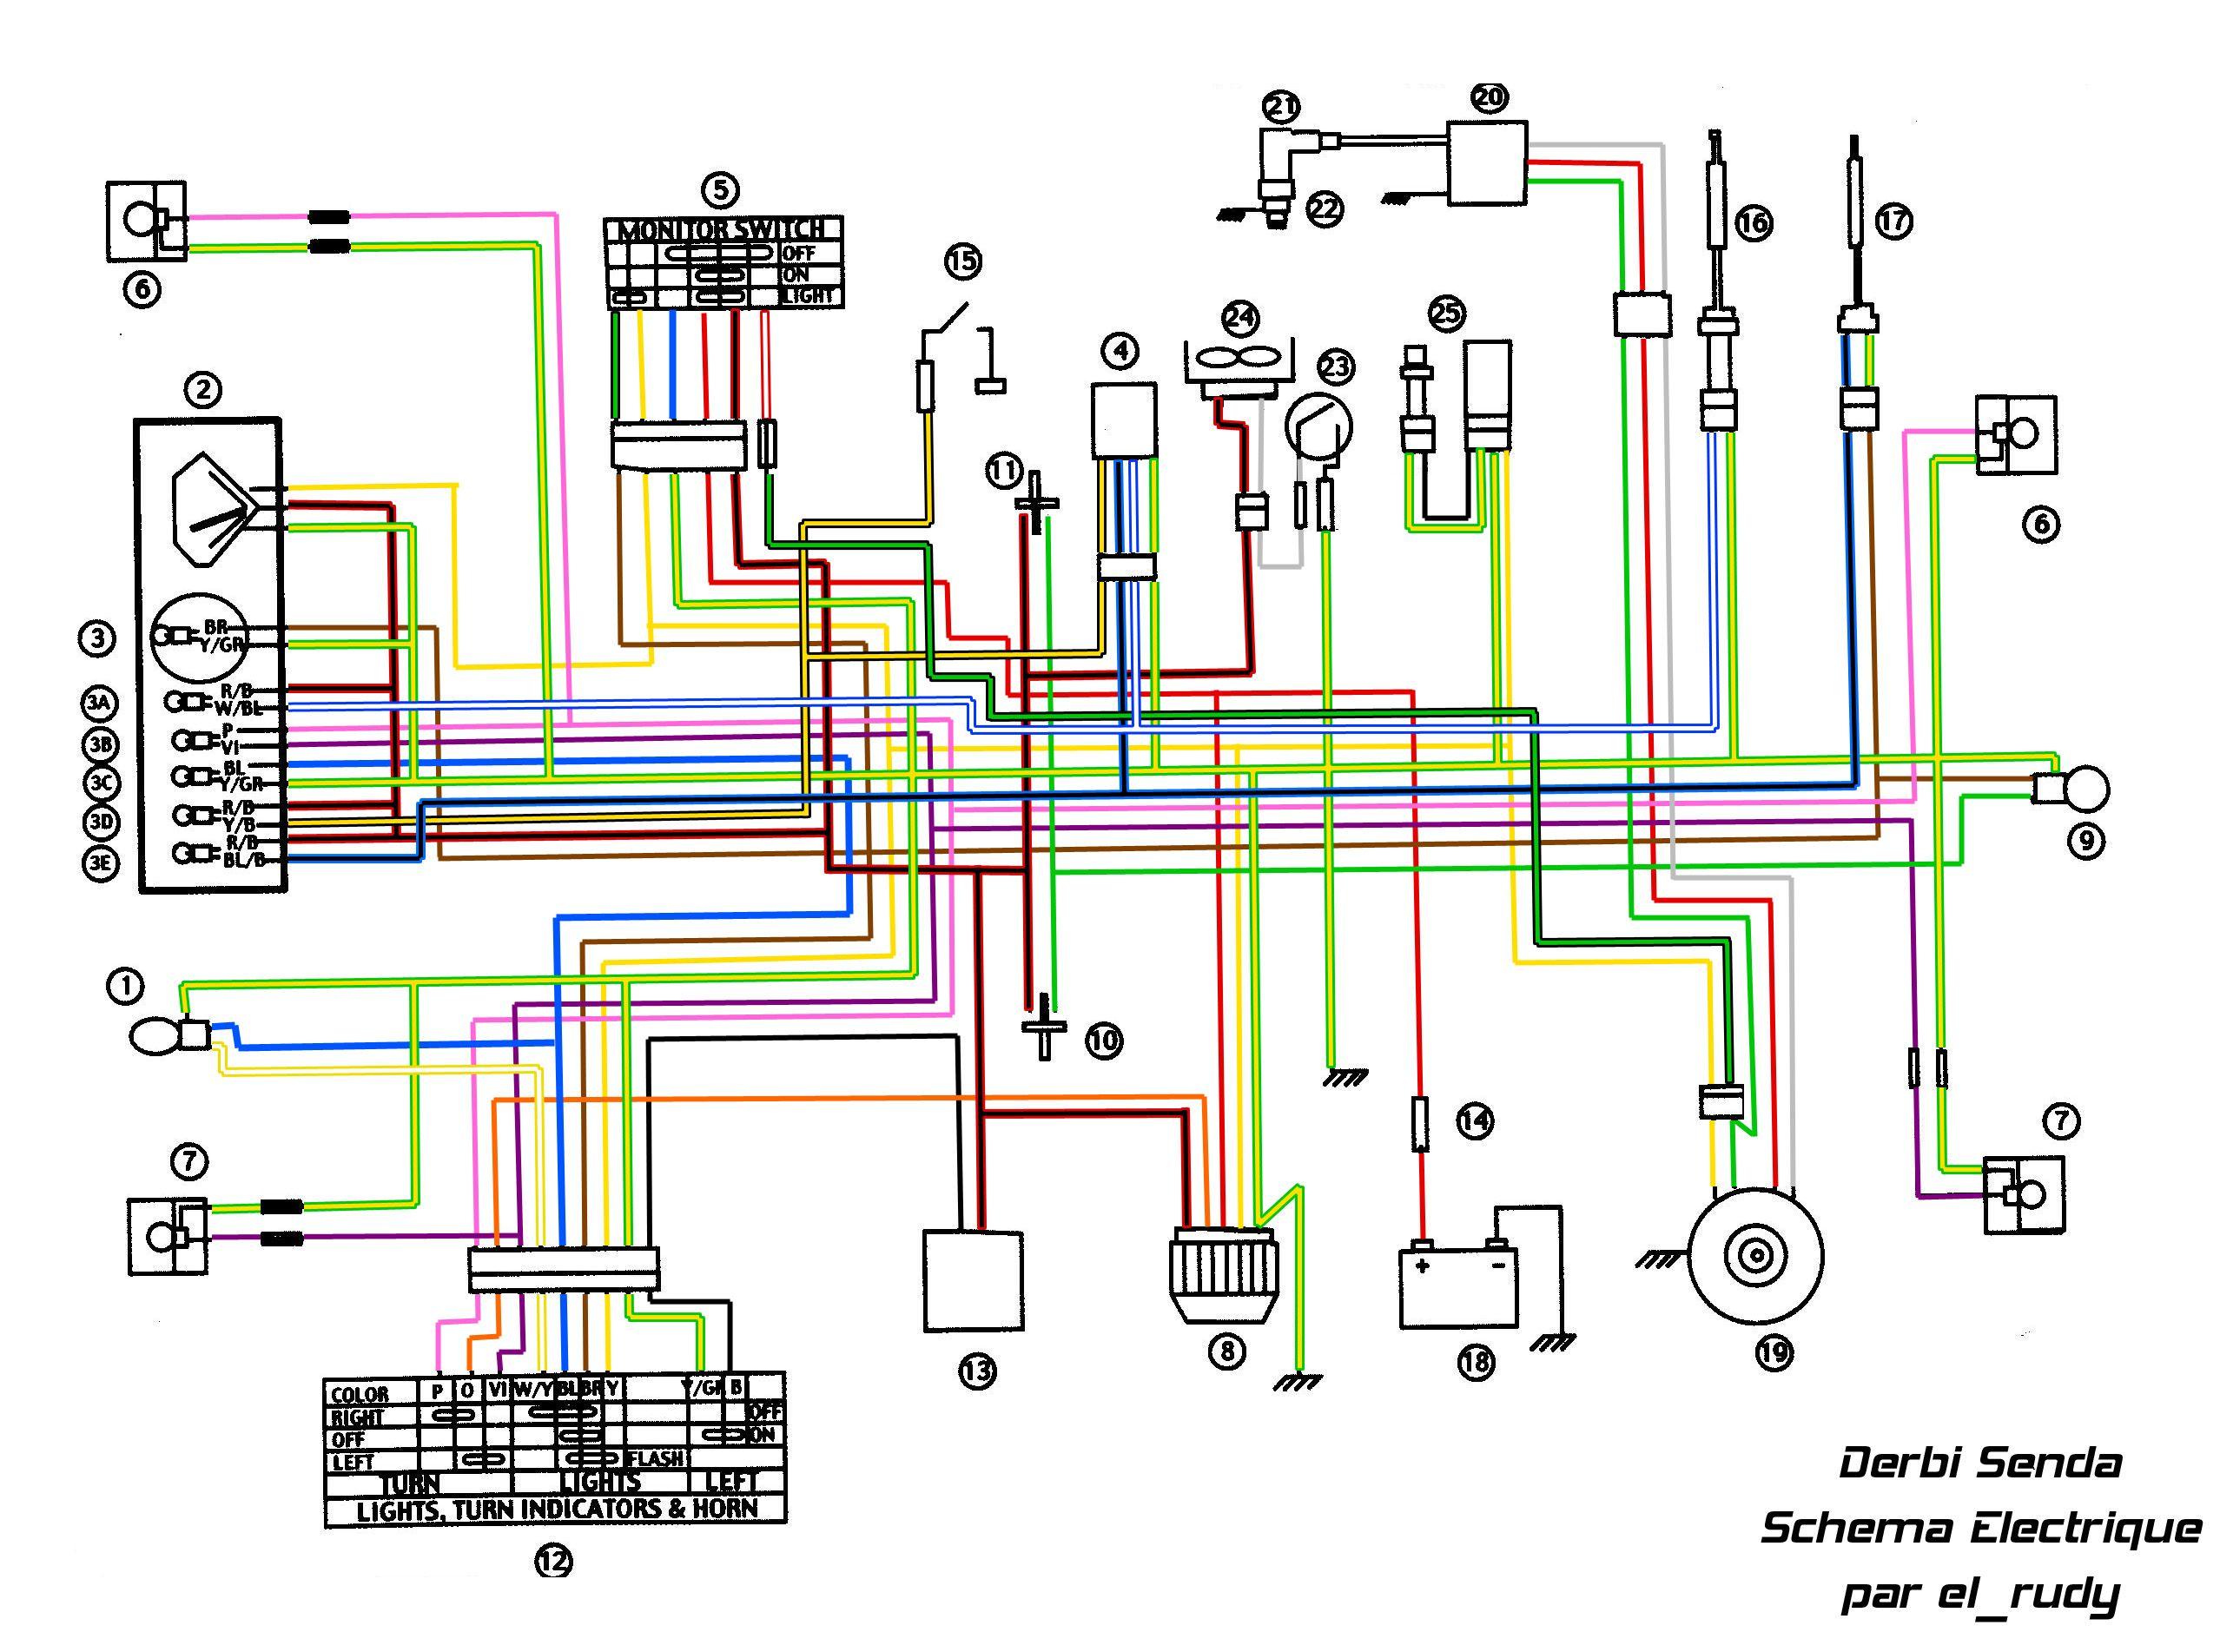 Indicator Flasher Relay For Derbi Senda 50 SM DRD Pro 2008